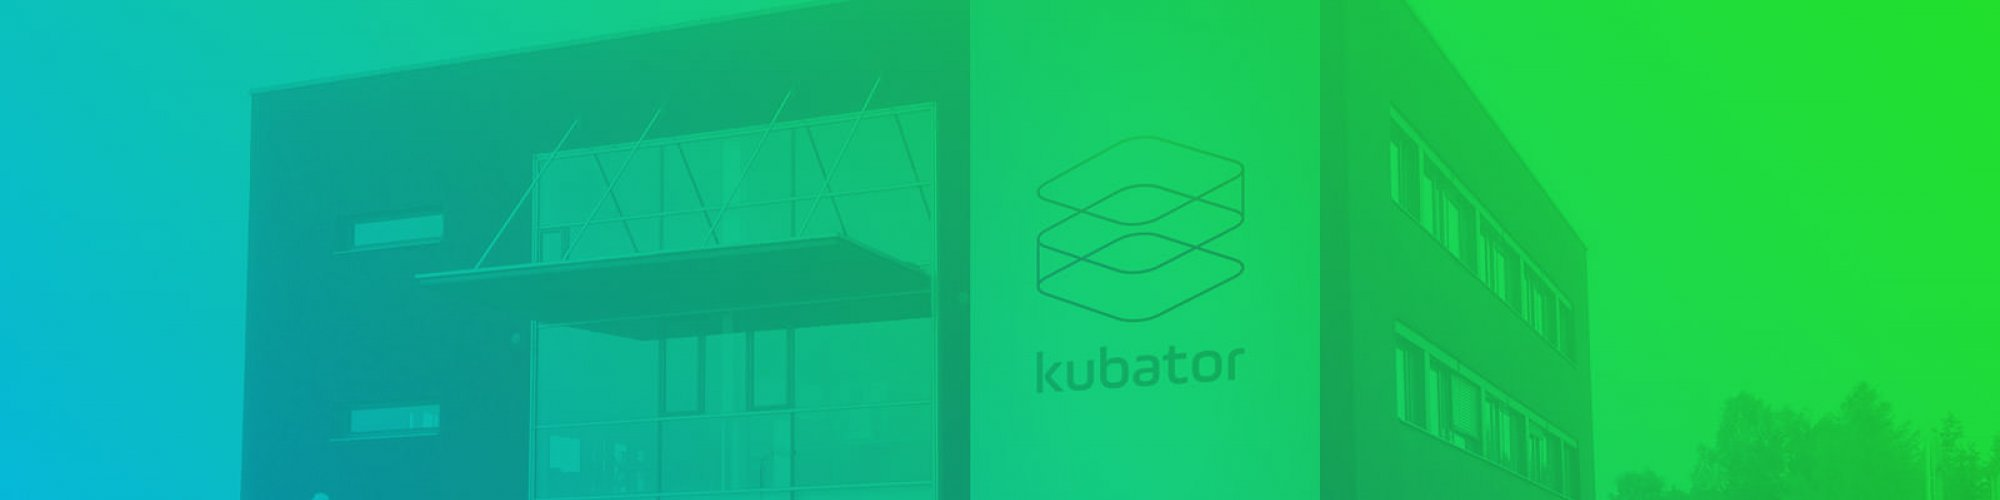 kubator | Technology & Startup Center